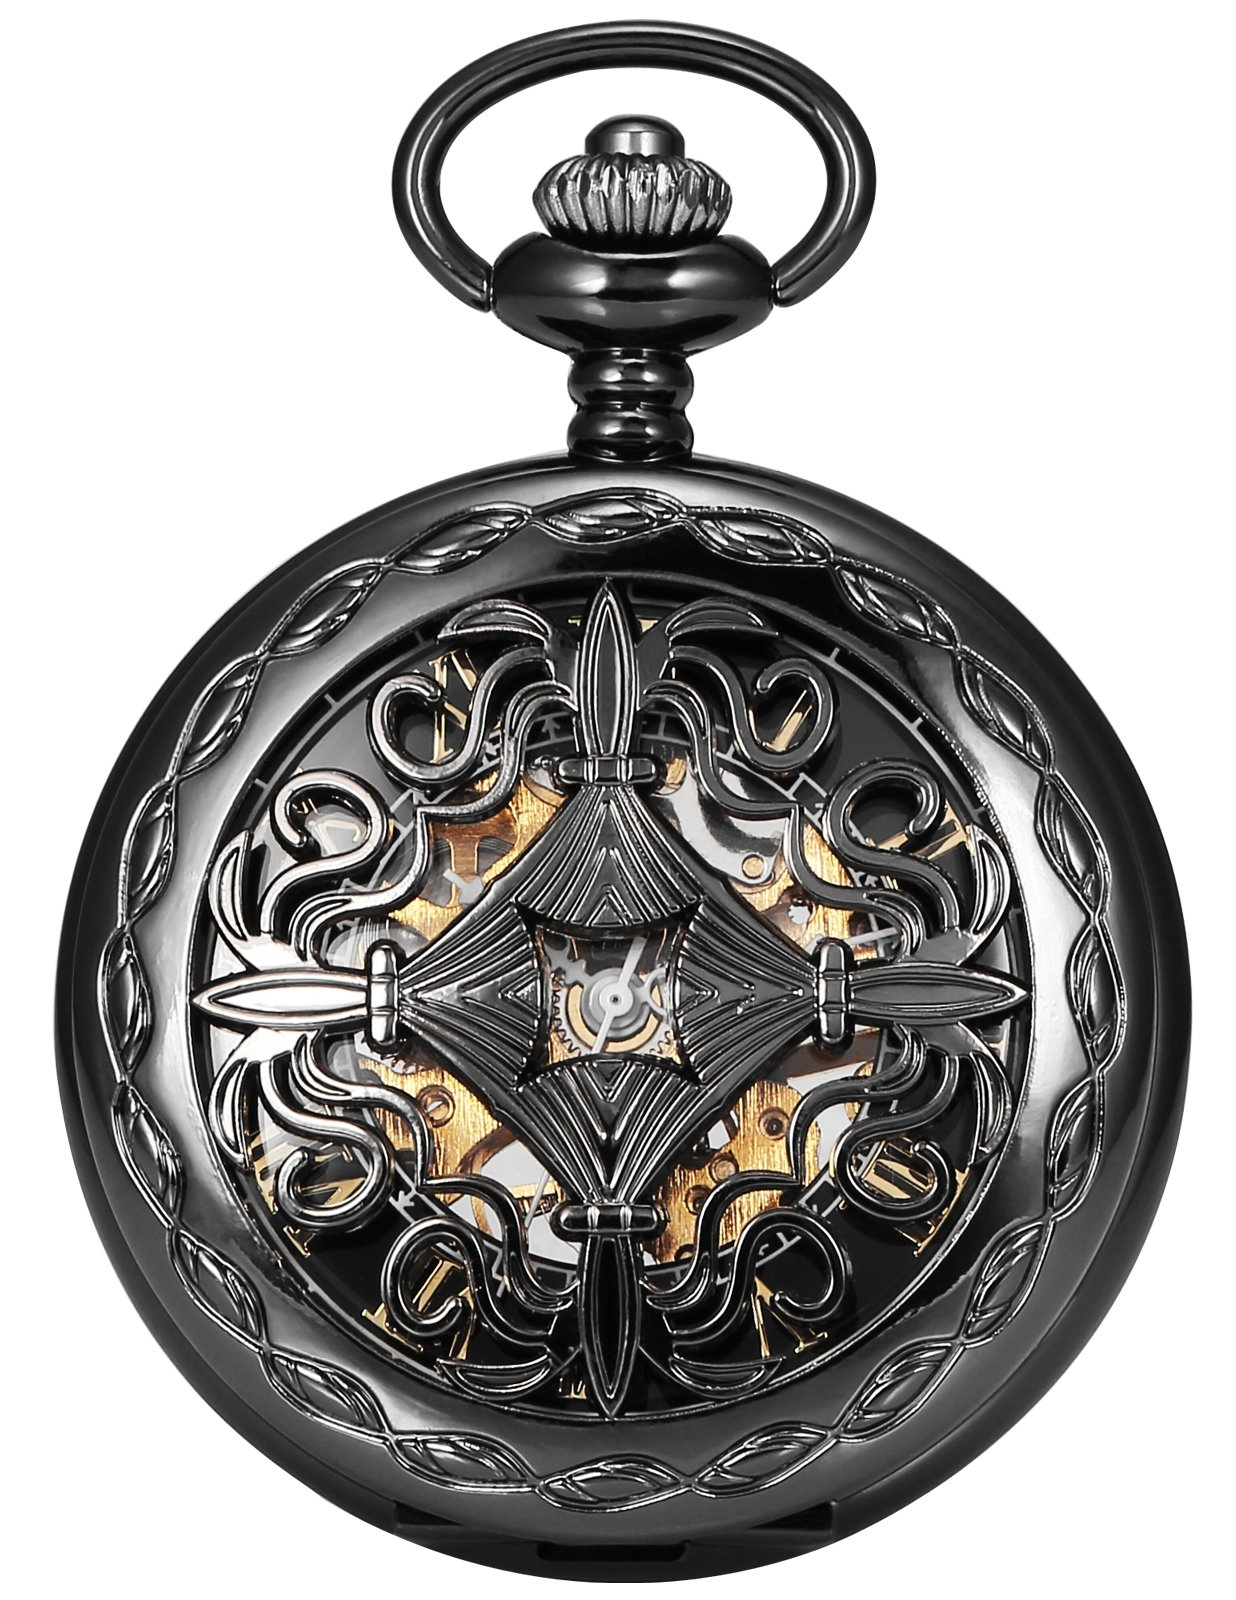 AMPM24 Steampunk Black Copper Case Skeleton Mechanical Pocket Watch Fob WPK167 3